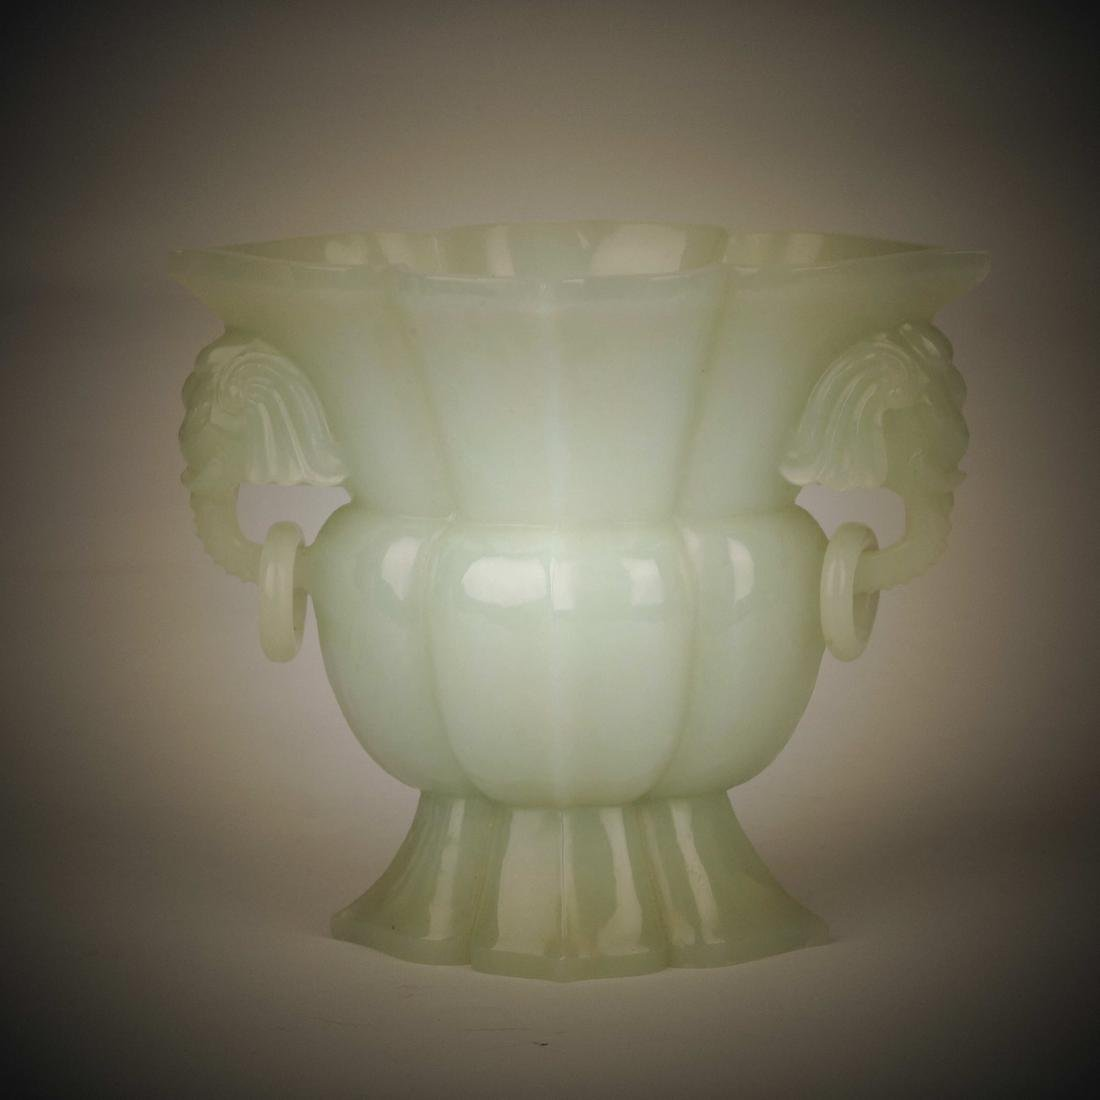 Chinese Hetian white jade bottle